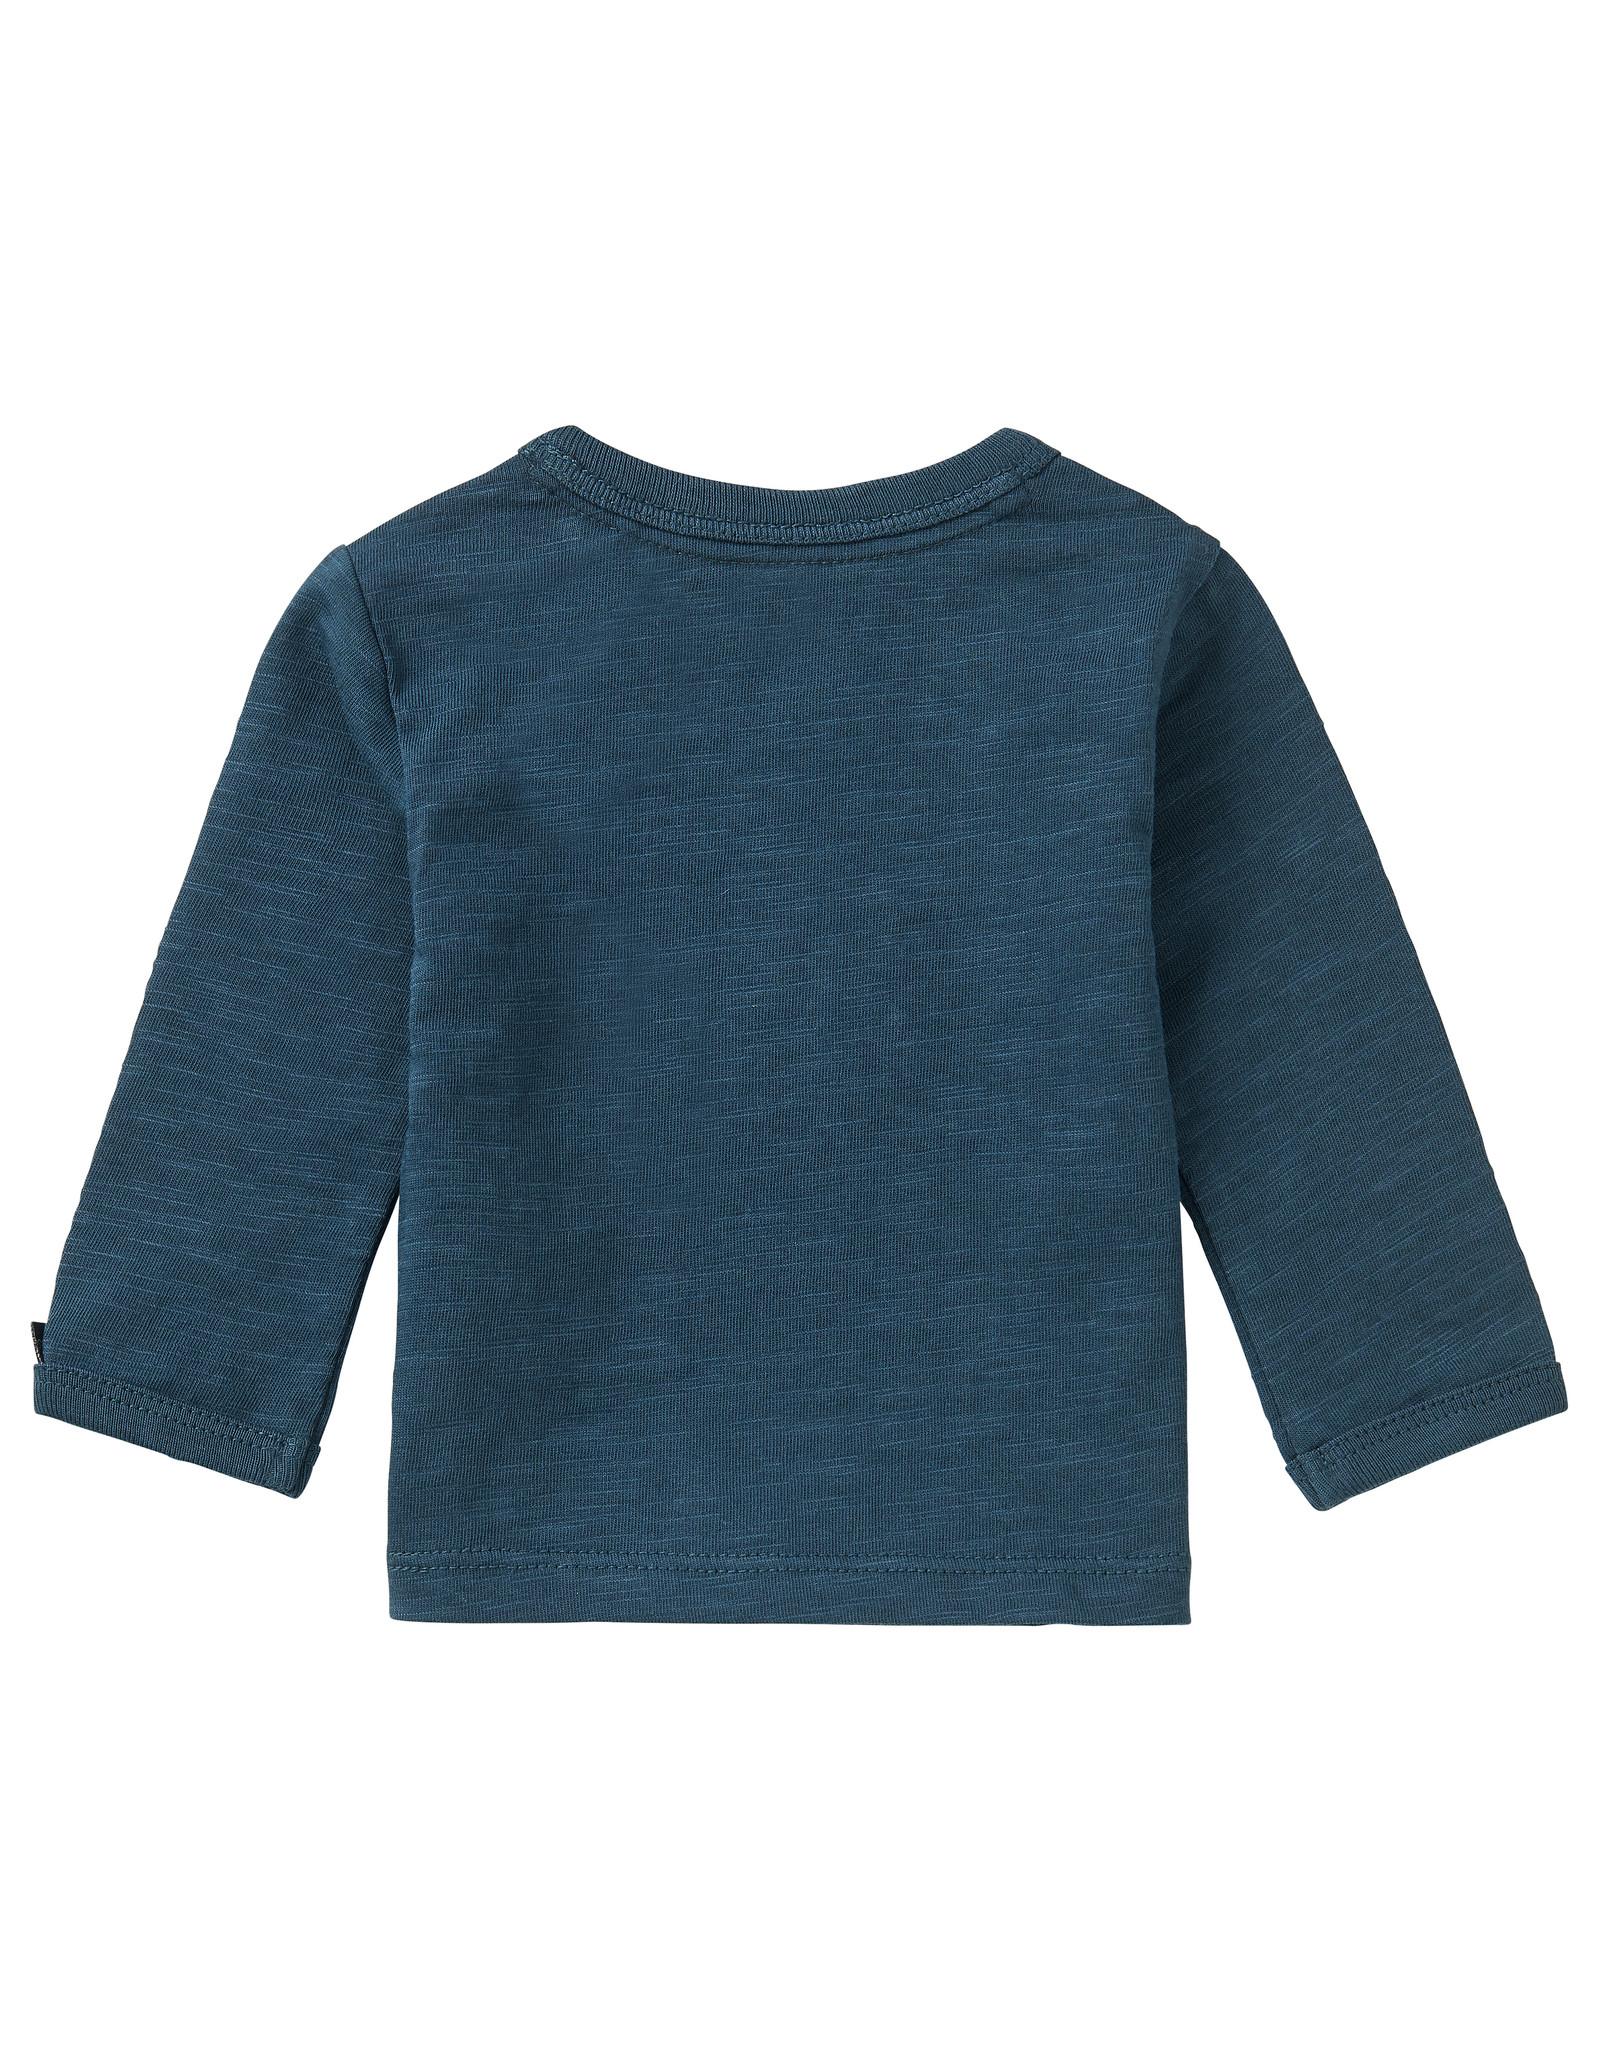 Noppies B T-Shirt LS Koffiebaai, Midnight Navy